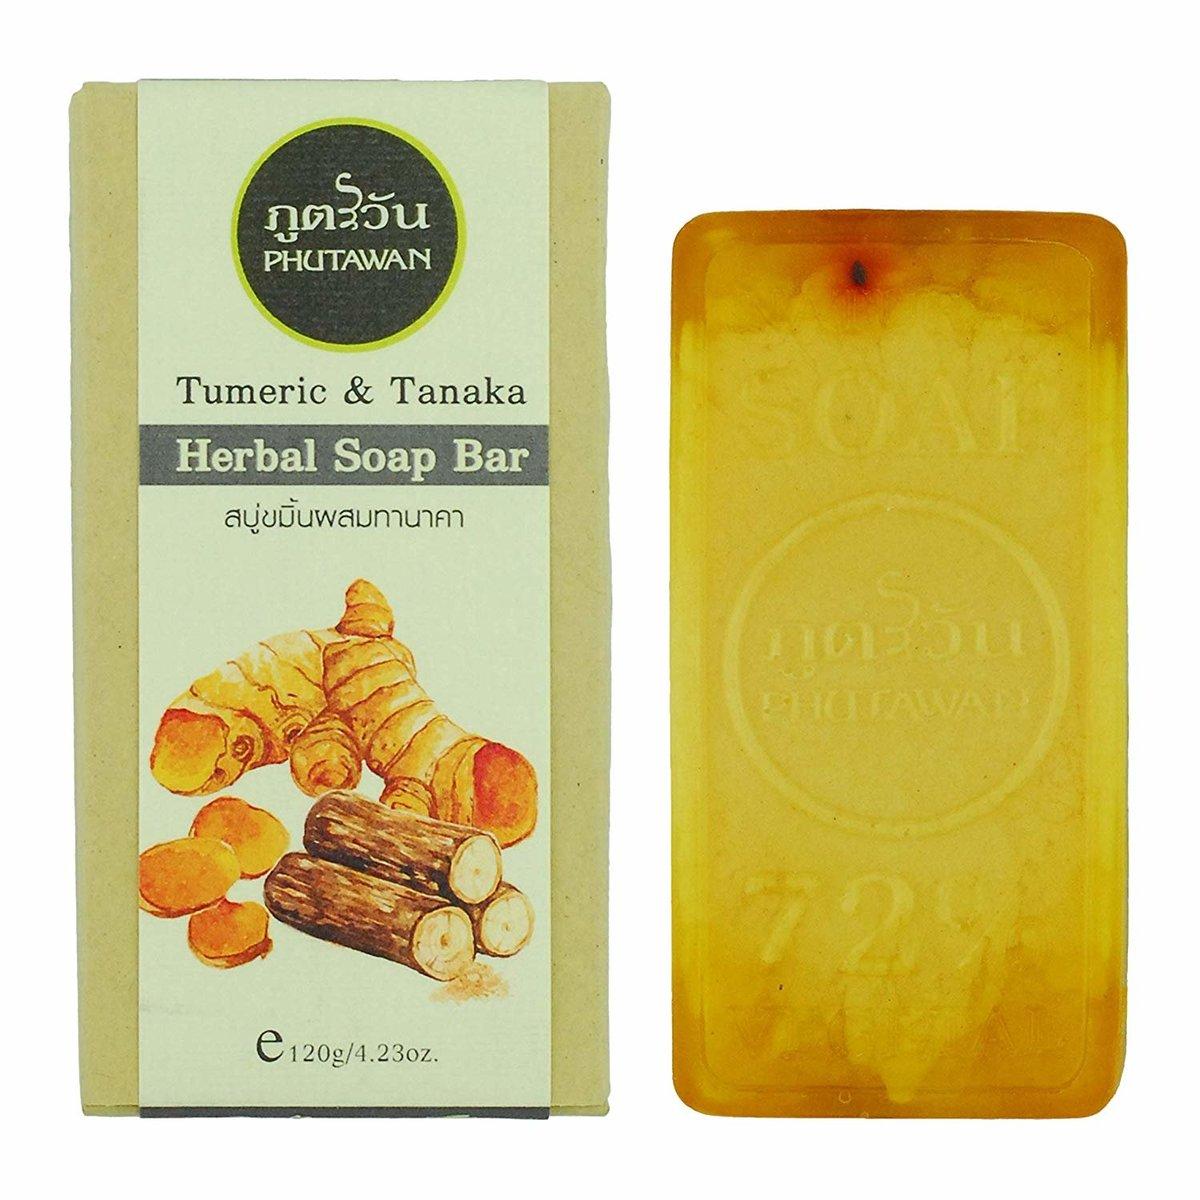 PHUTAWAN Herbal Soap Bar 普妲旺 天然有機手工香皂(Tumeric & Tanaka 薑黃) 120g 薑黃香皂